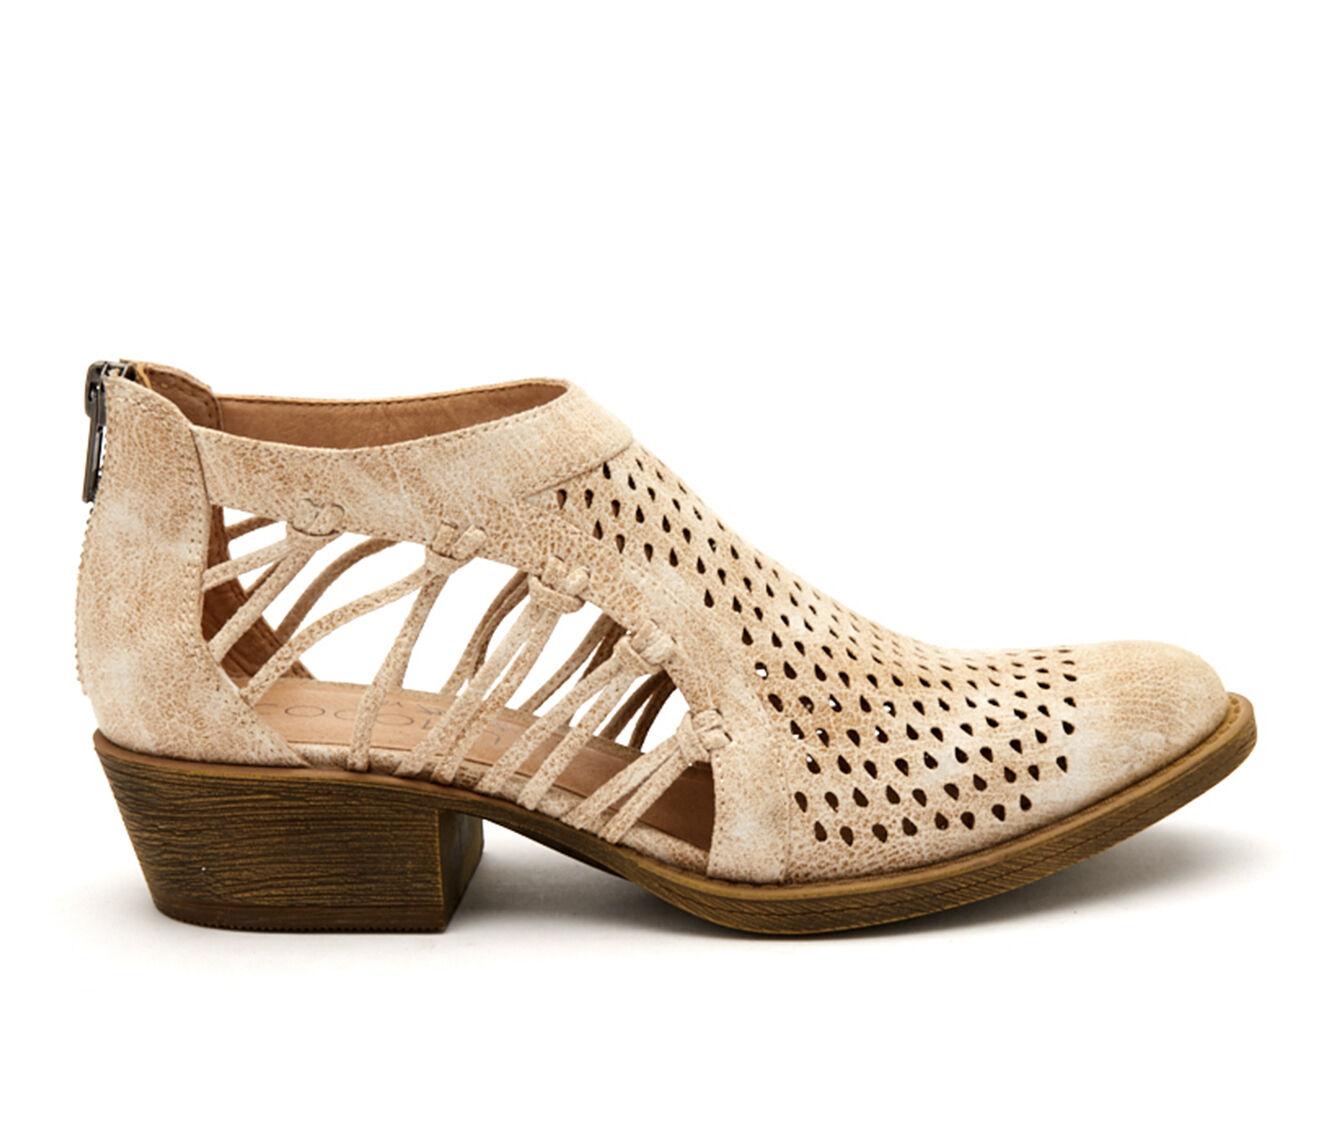 uk shoes_kd5347